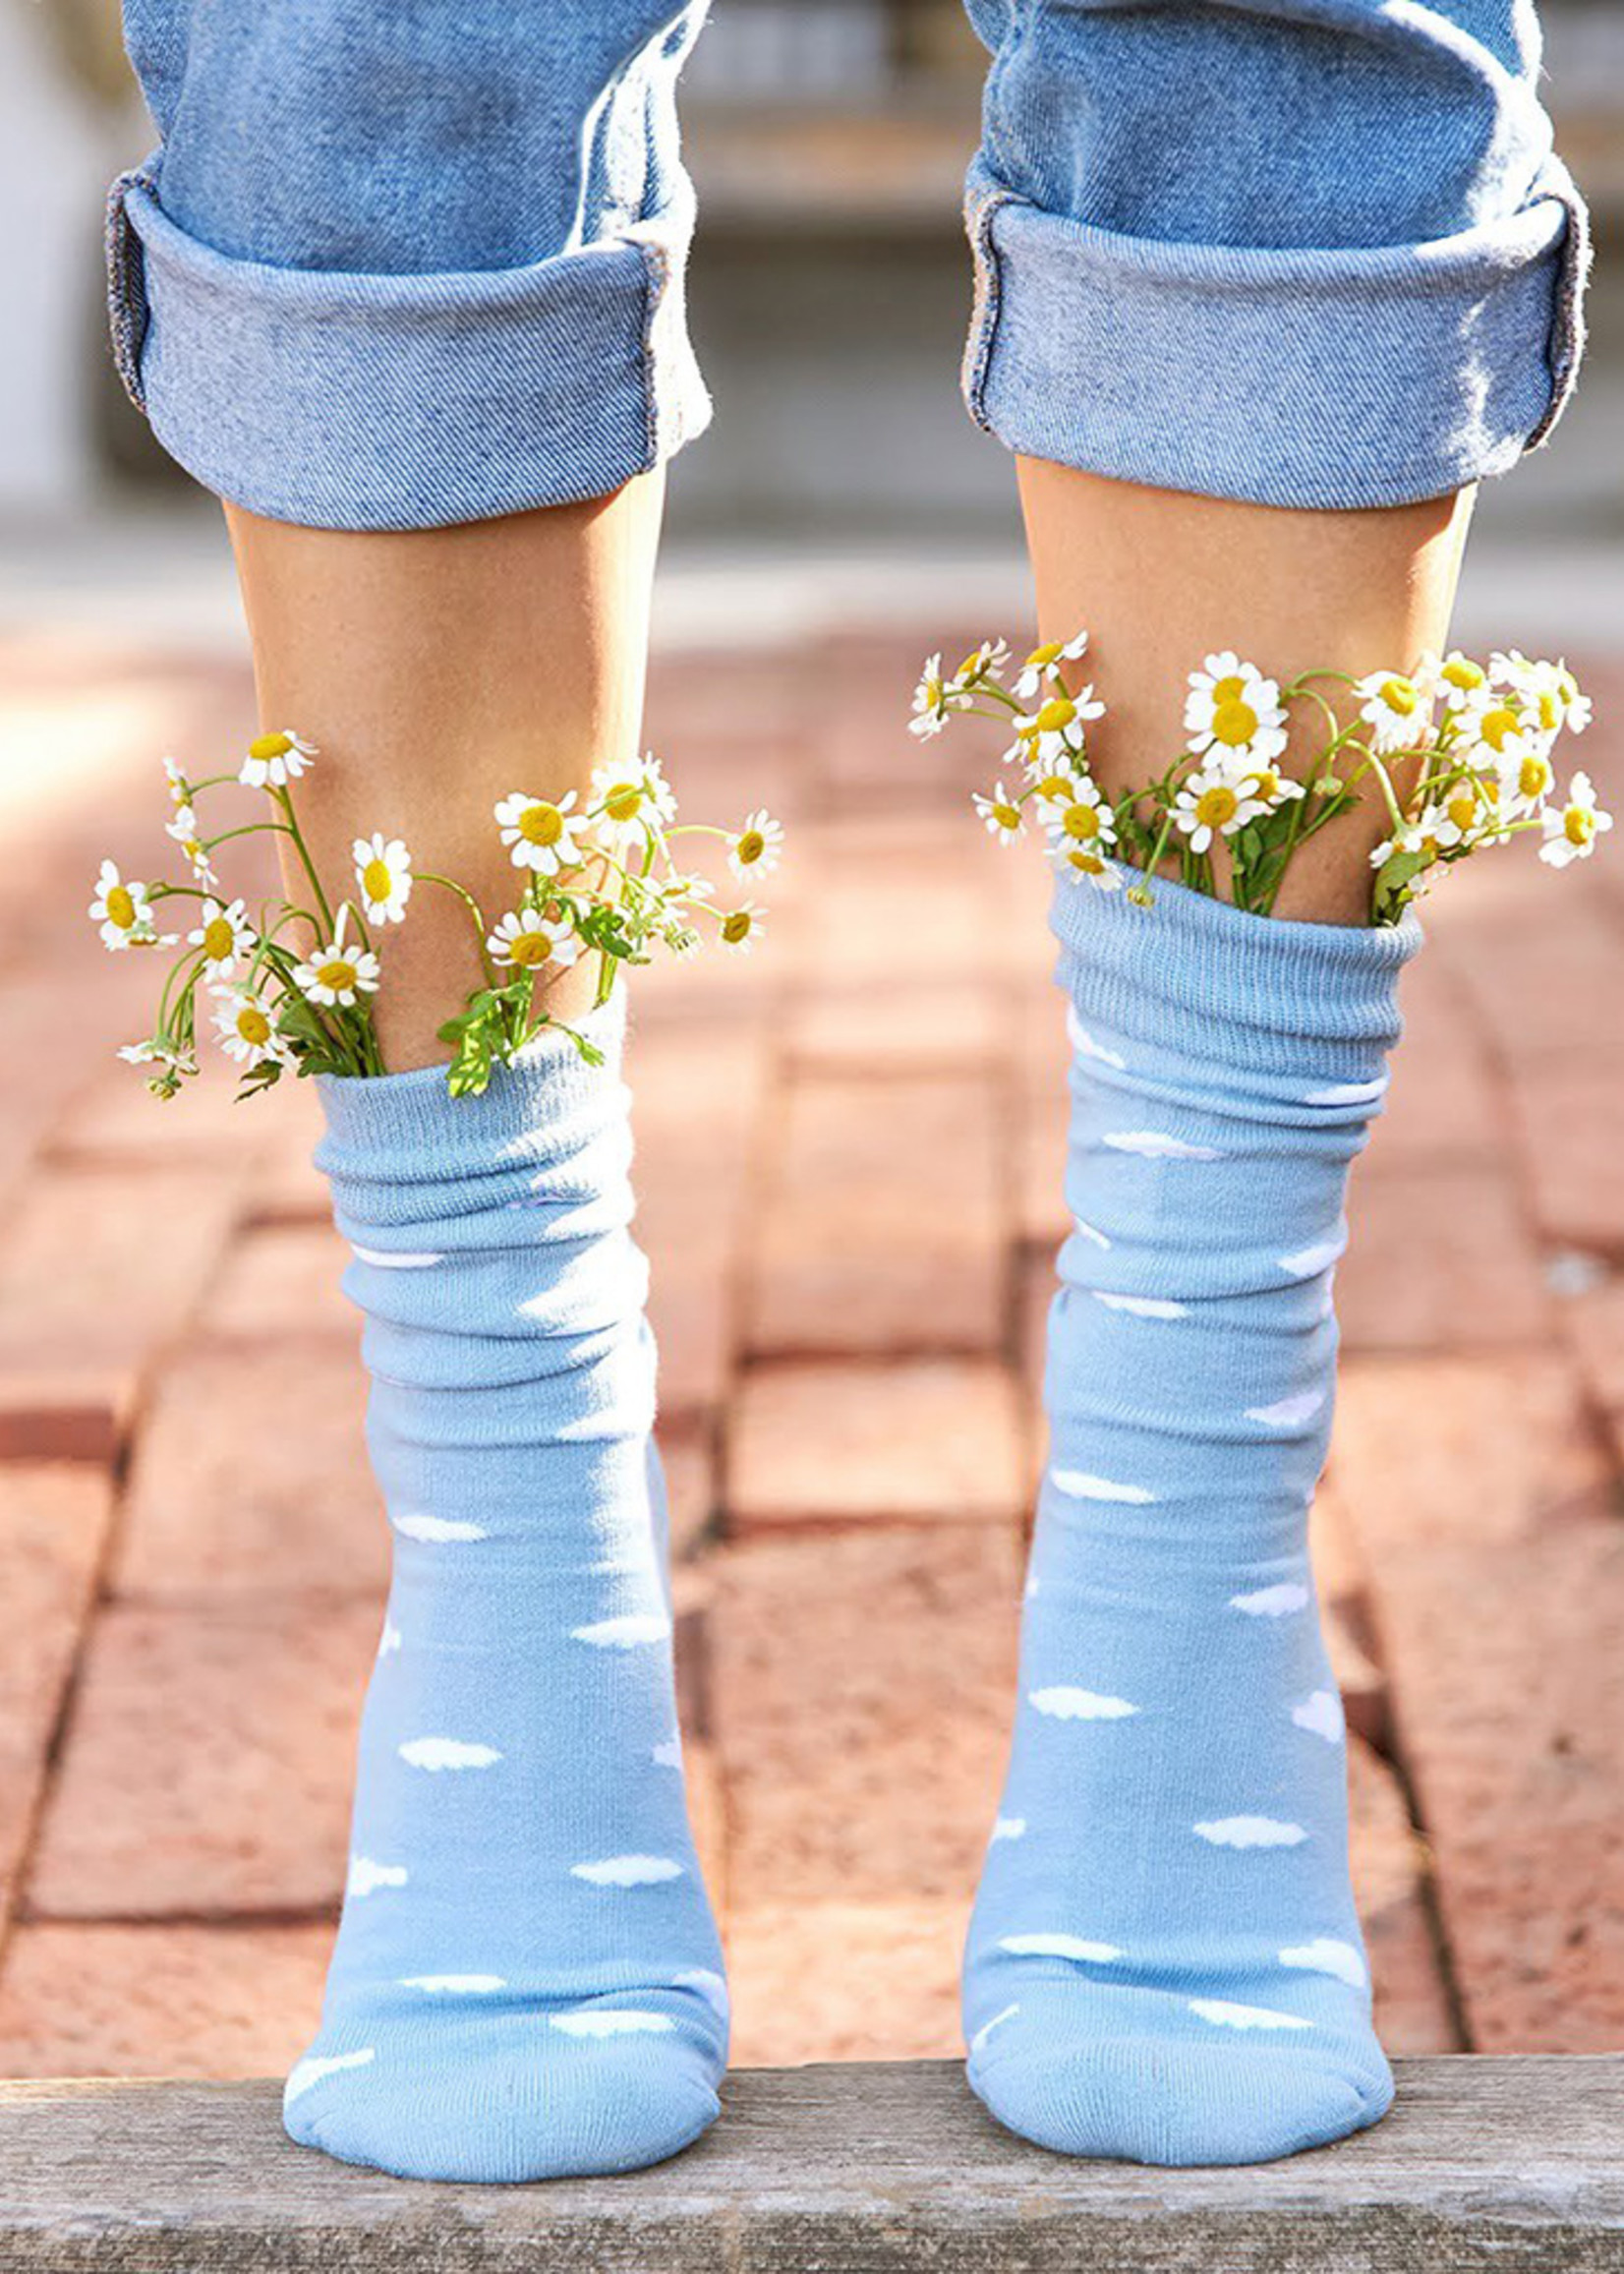 Conscious Step Men's Cloud Socks that Support Mental Health